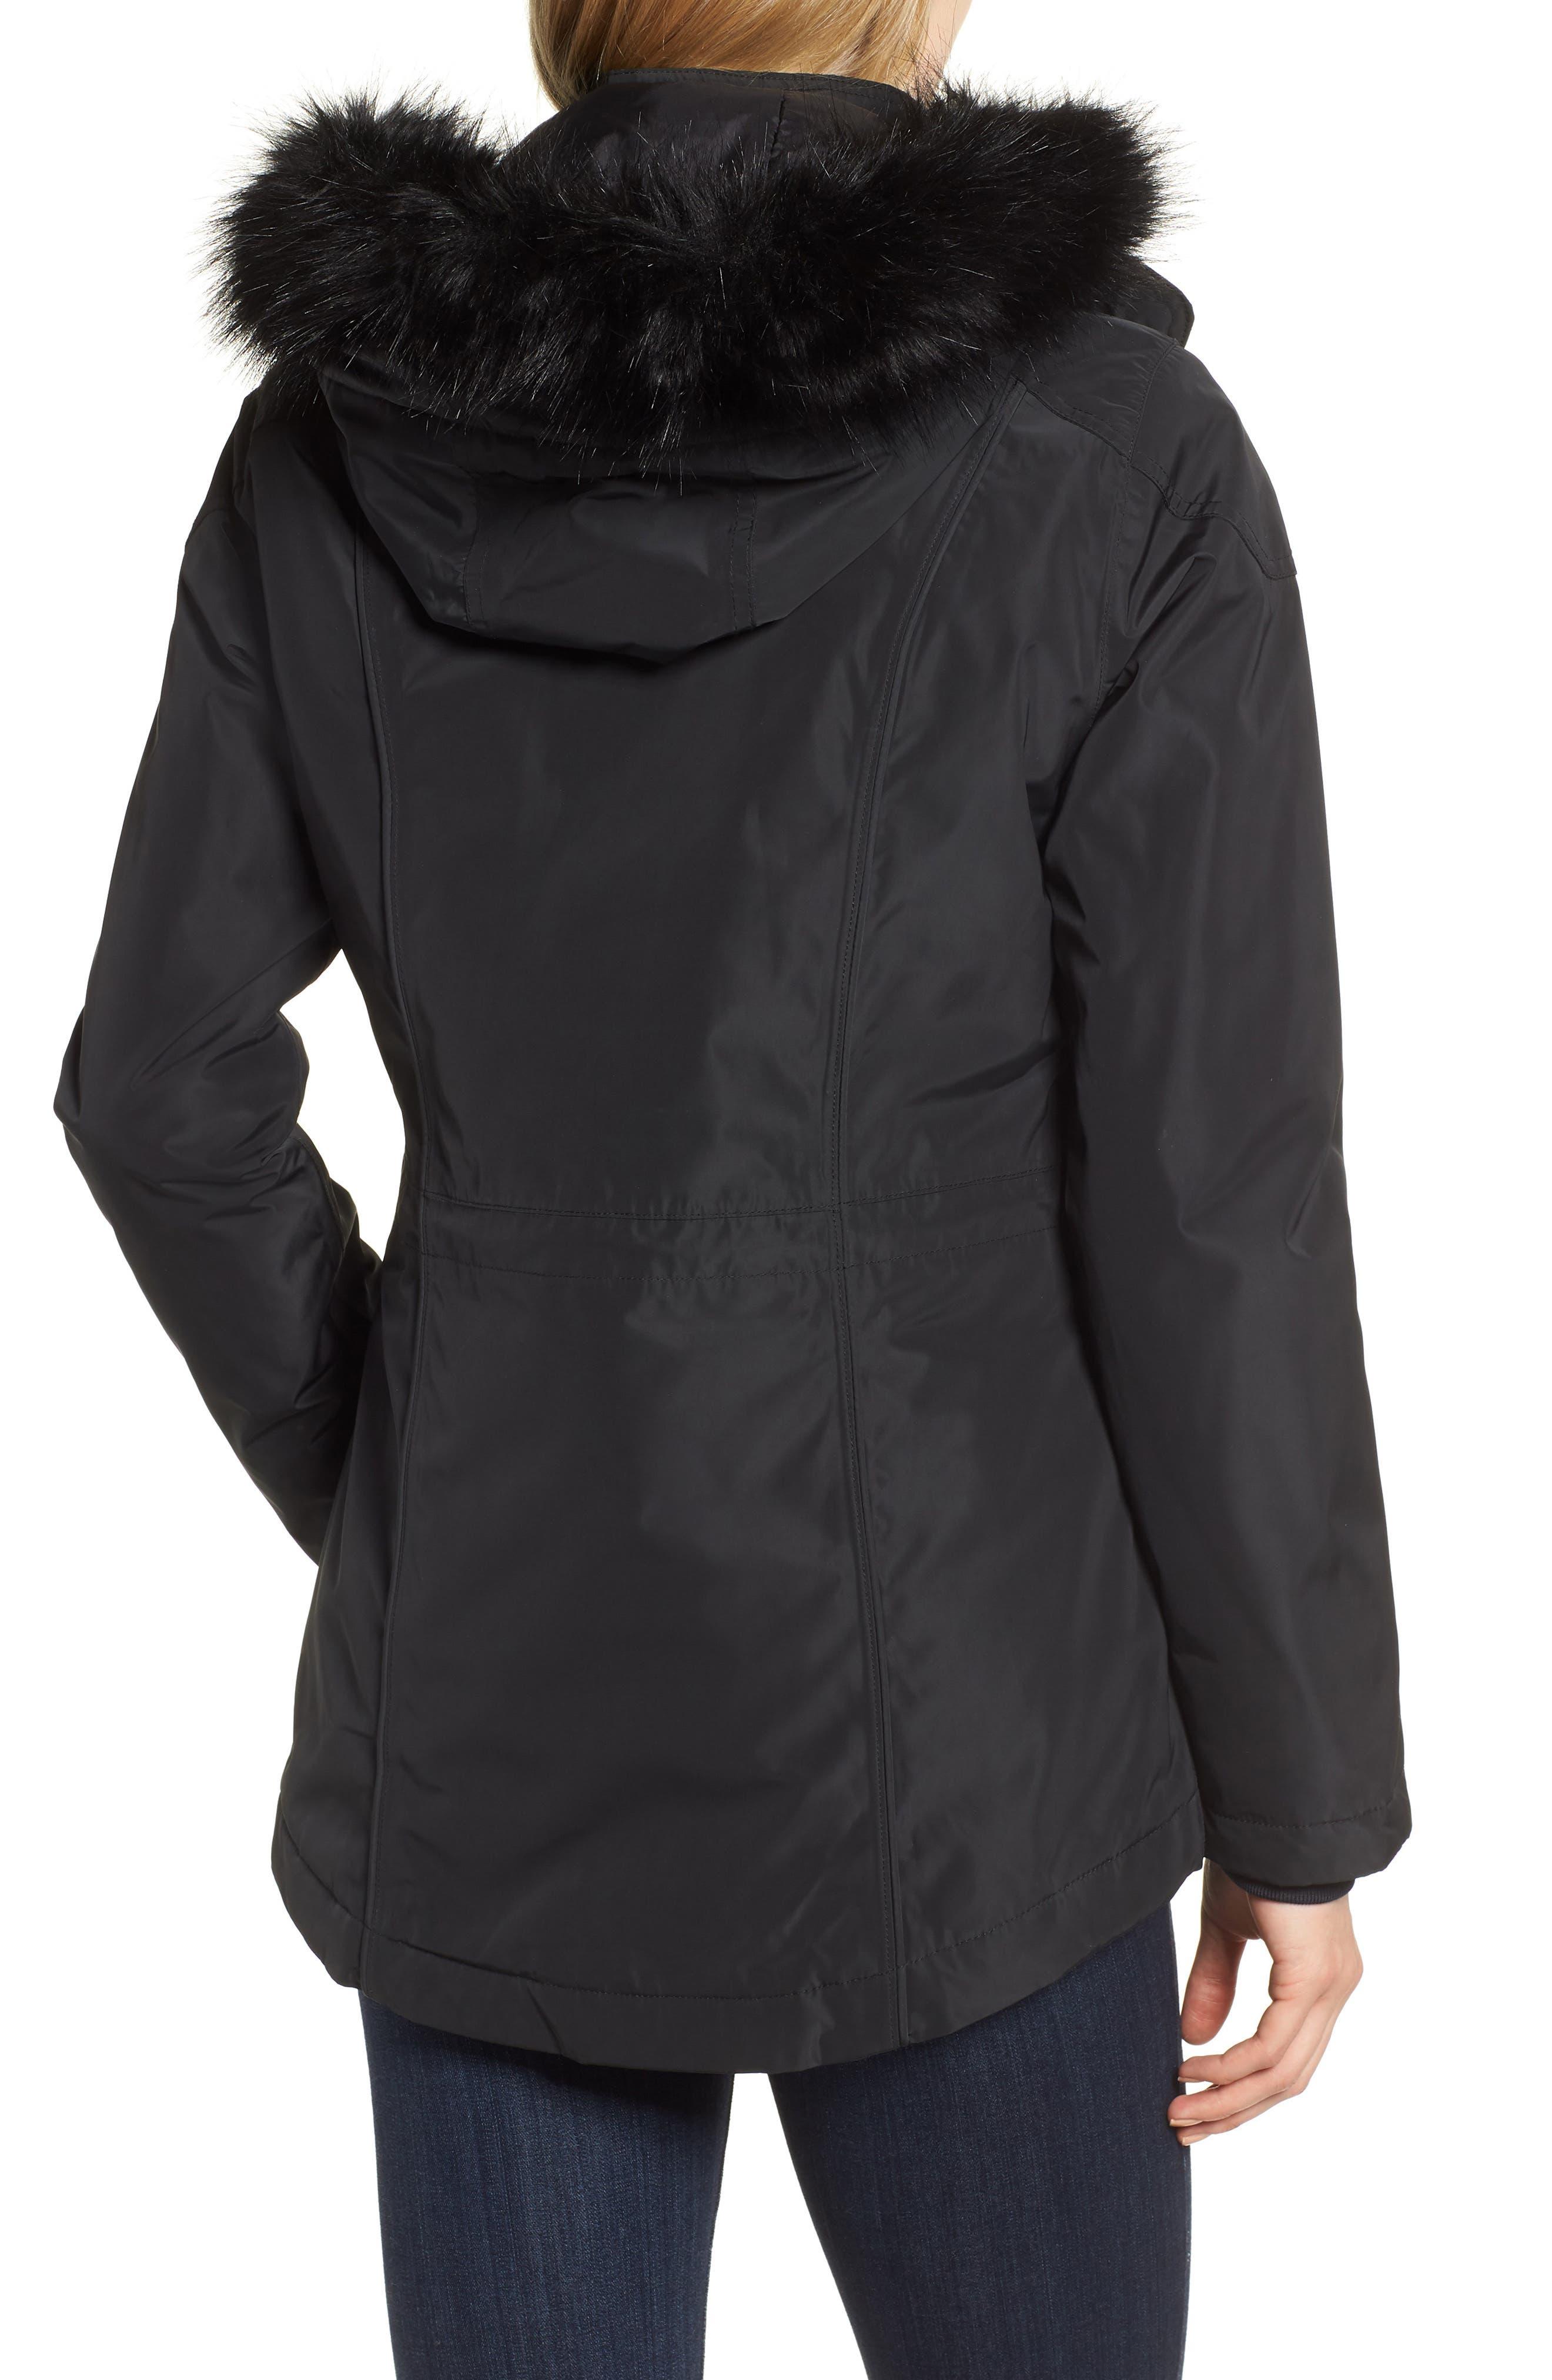 BARBOUR,                             International Aragon Waterproof Breathable Faux Fur Trim Jacket,                             Alternate thumbnail 2, color,                             001